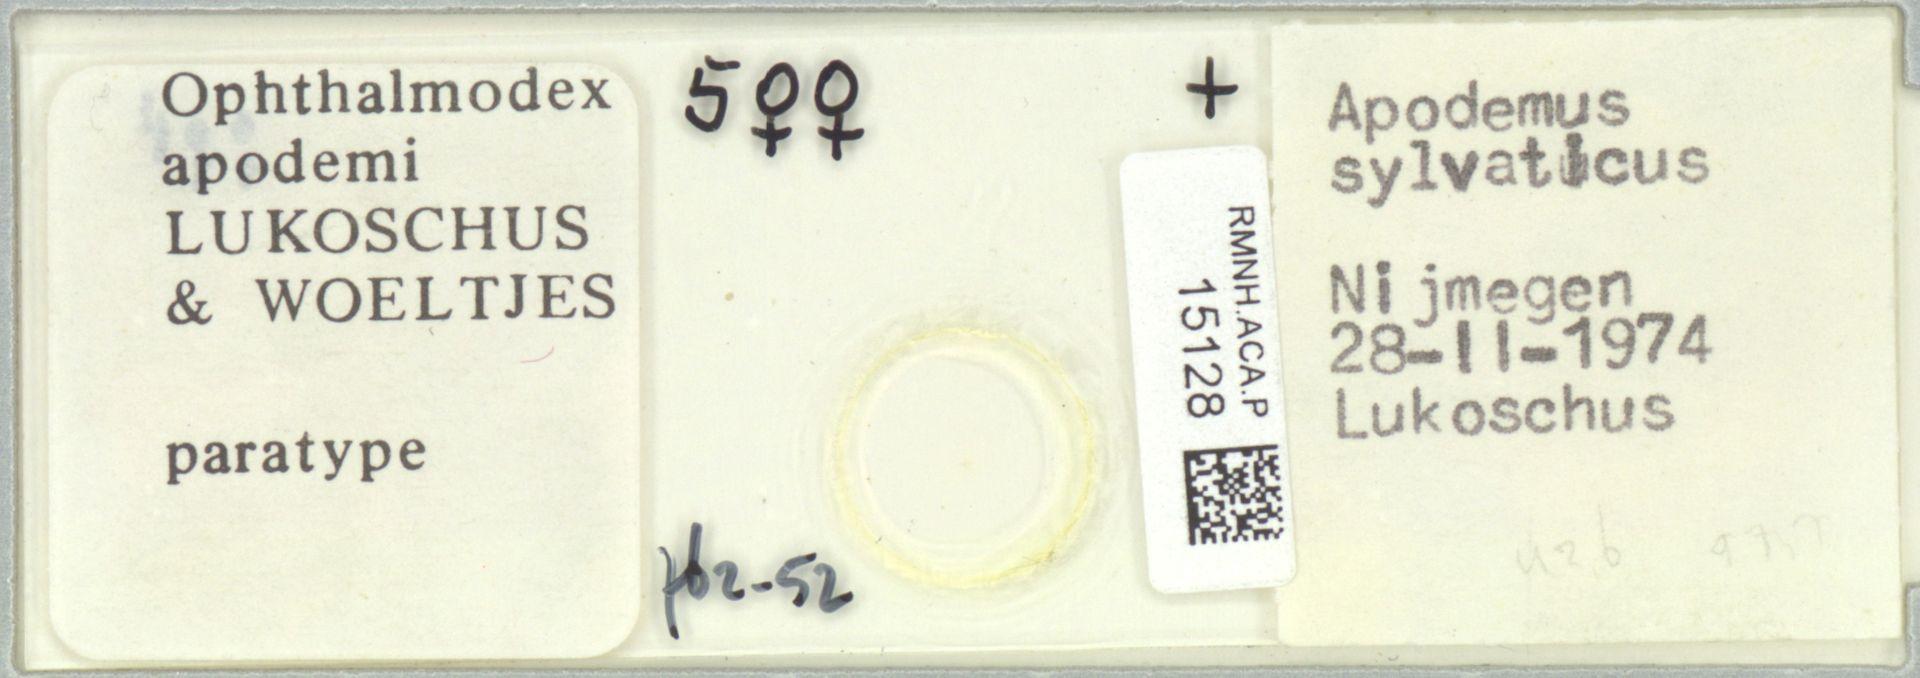 RMNH.ACA.P.15128 | Ophthalmodex apodemi Lukoschus & Woeltjes